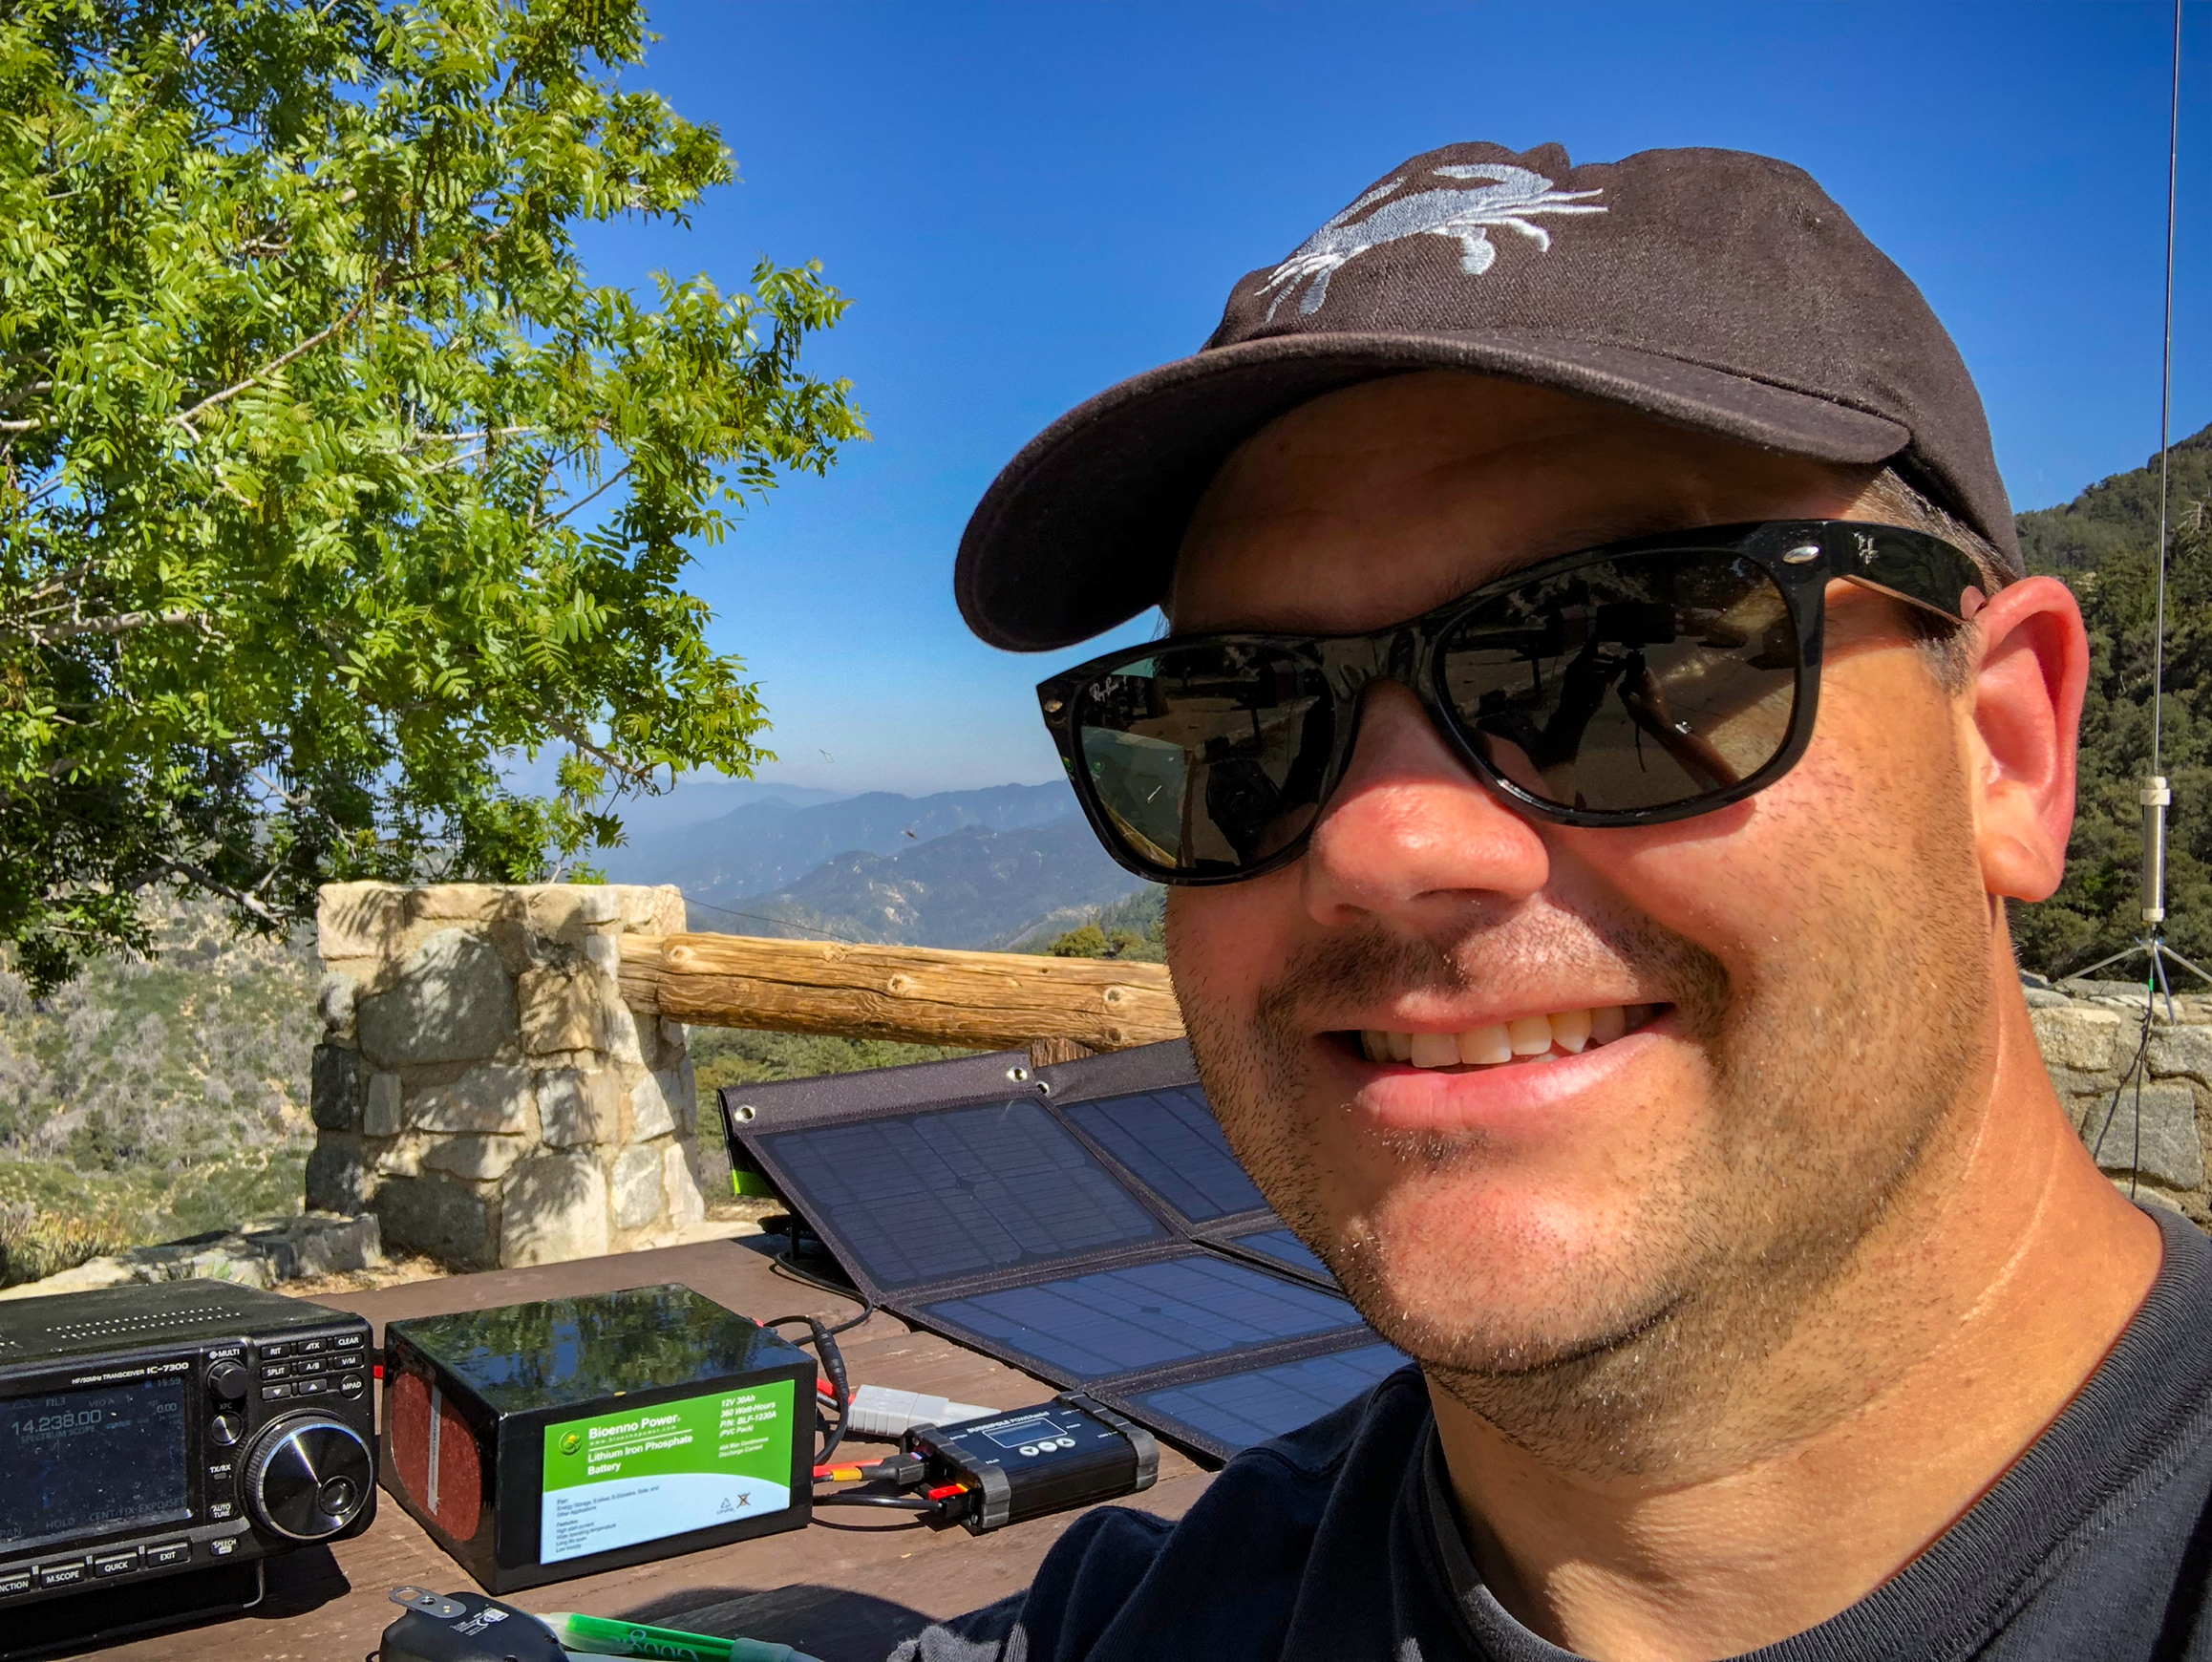 Chris Mattia, W6AH operating a portable ham radio station.